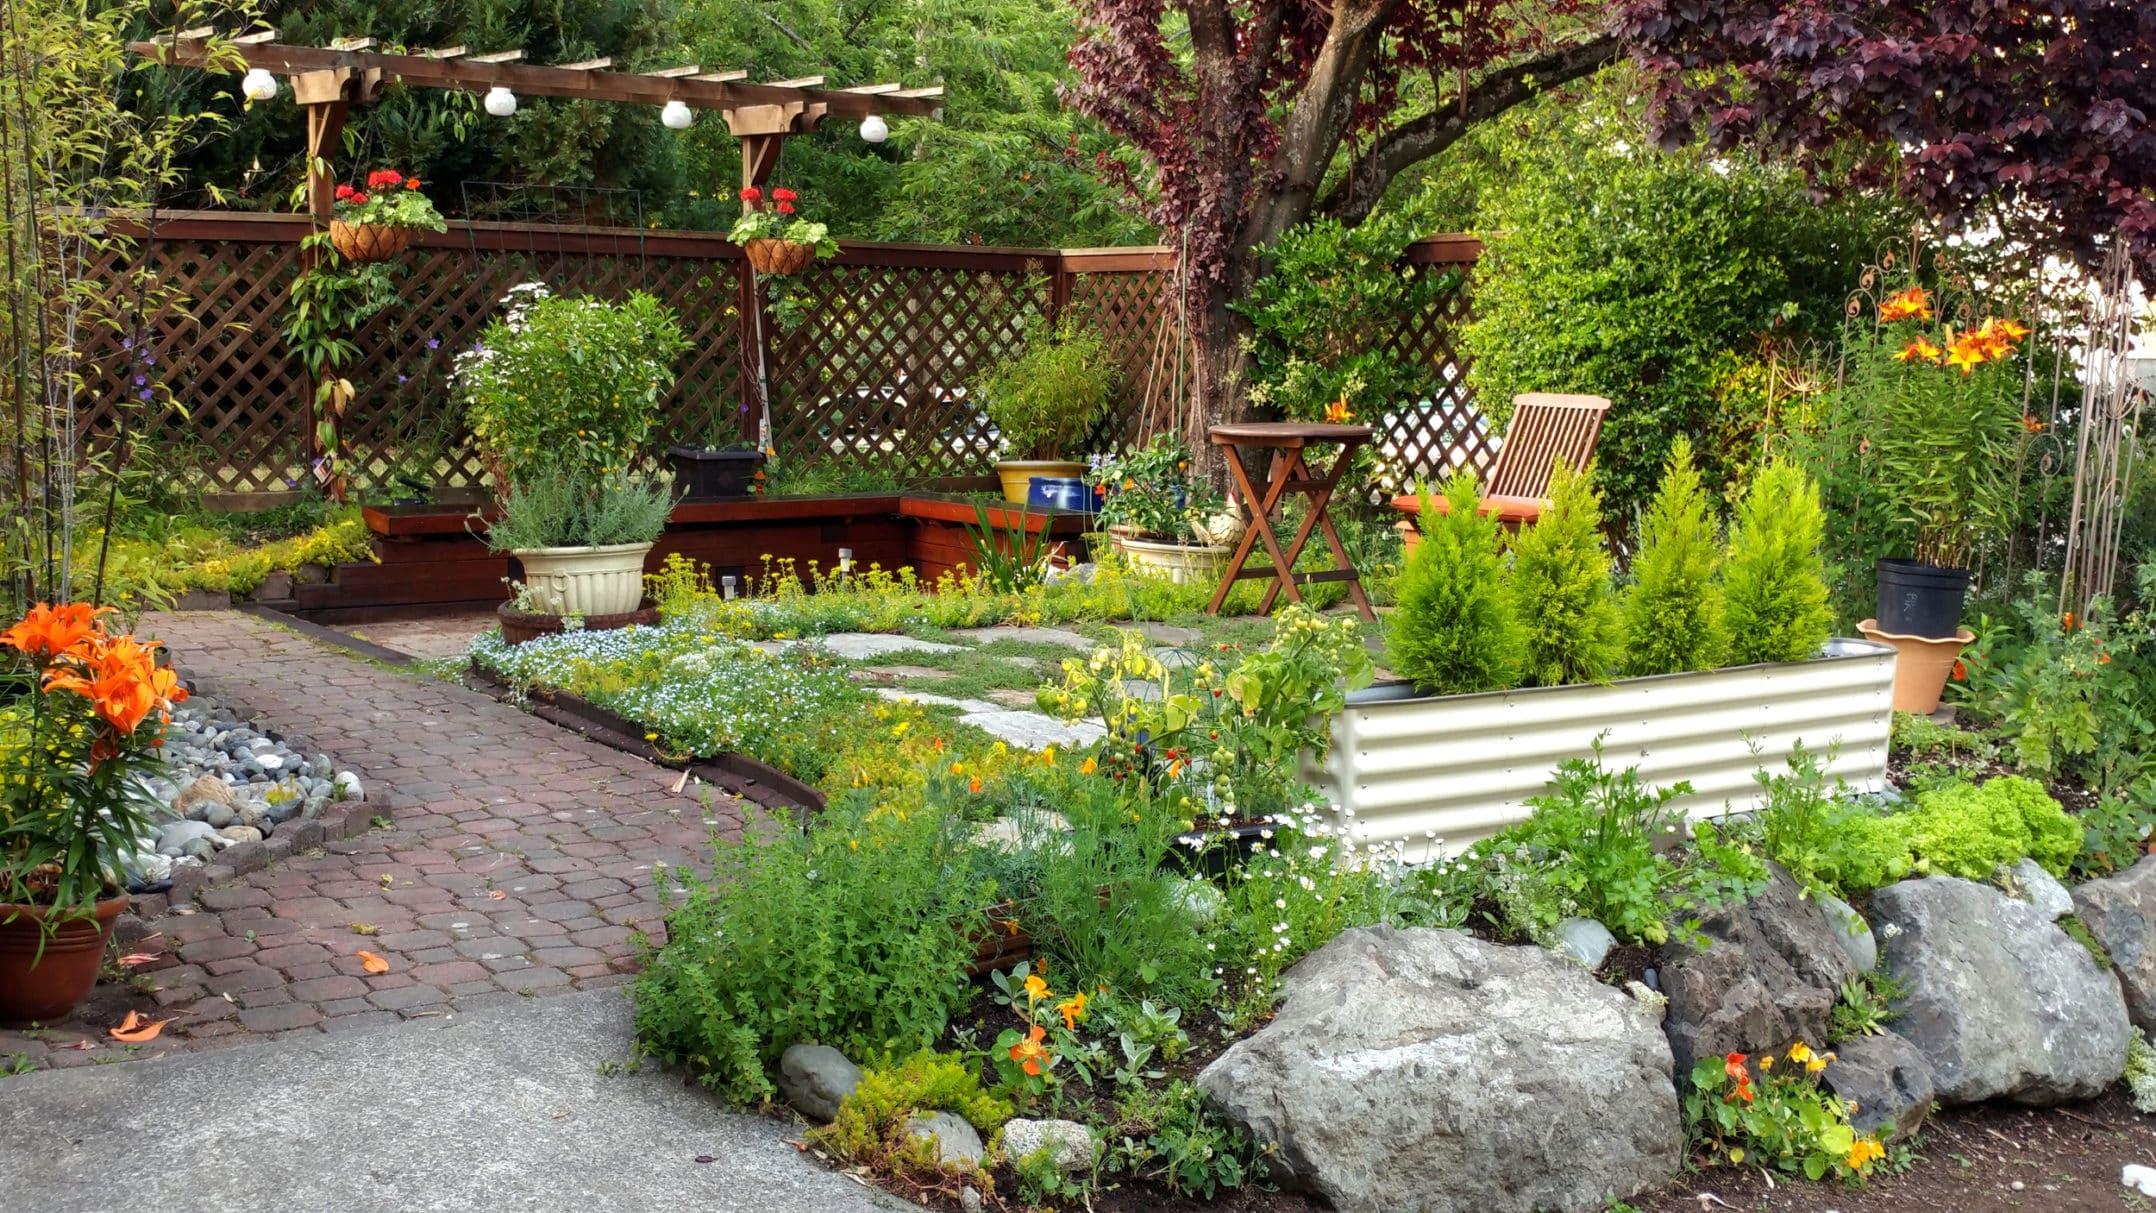 backyard bird sanctuary urban style google search on beautiful backyard garden design ideas and remodel create your extraordinary garden id=81495